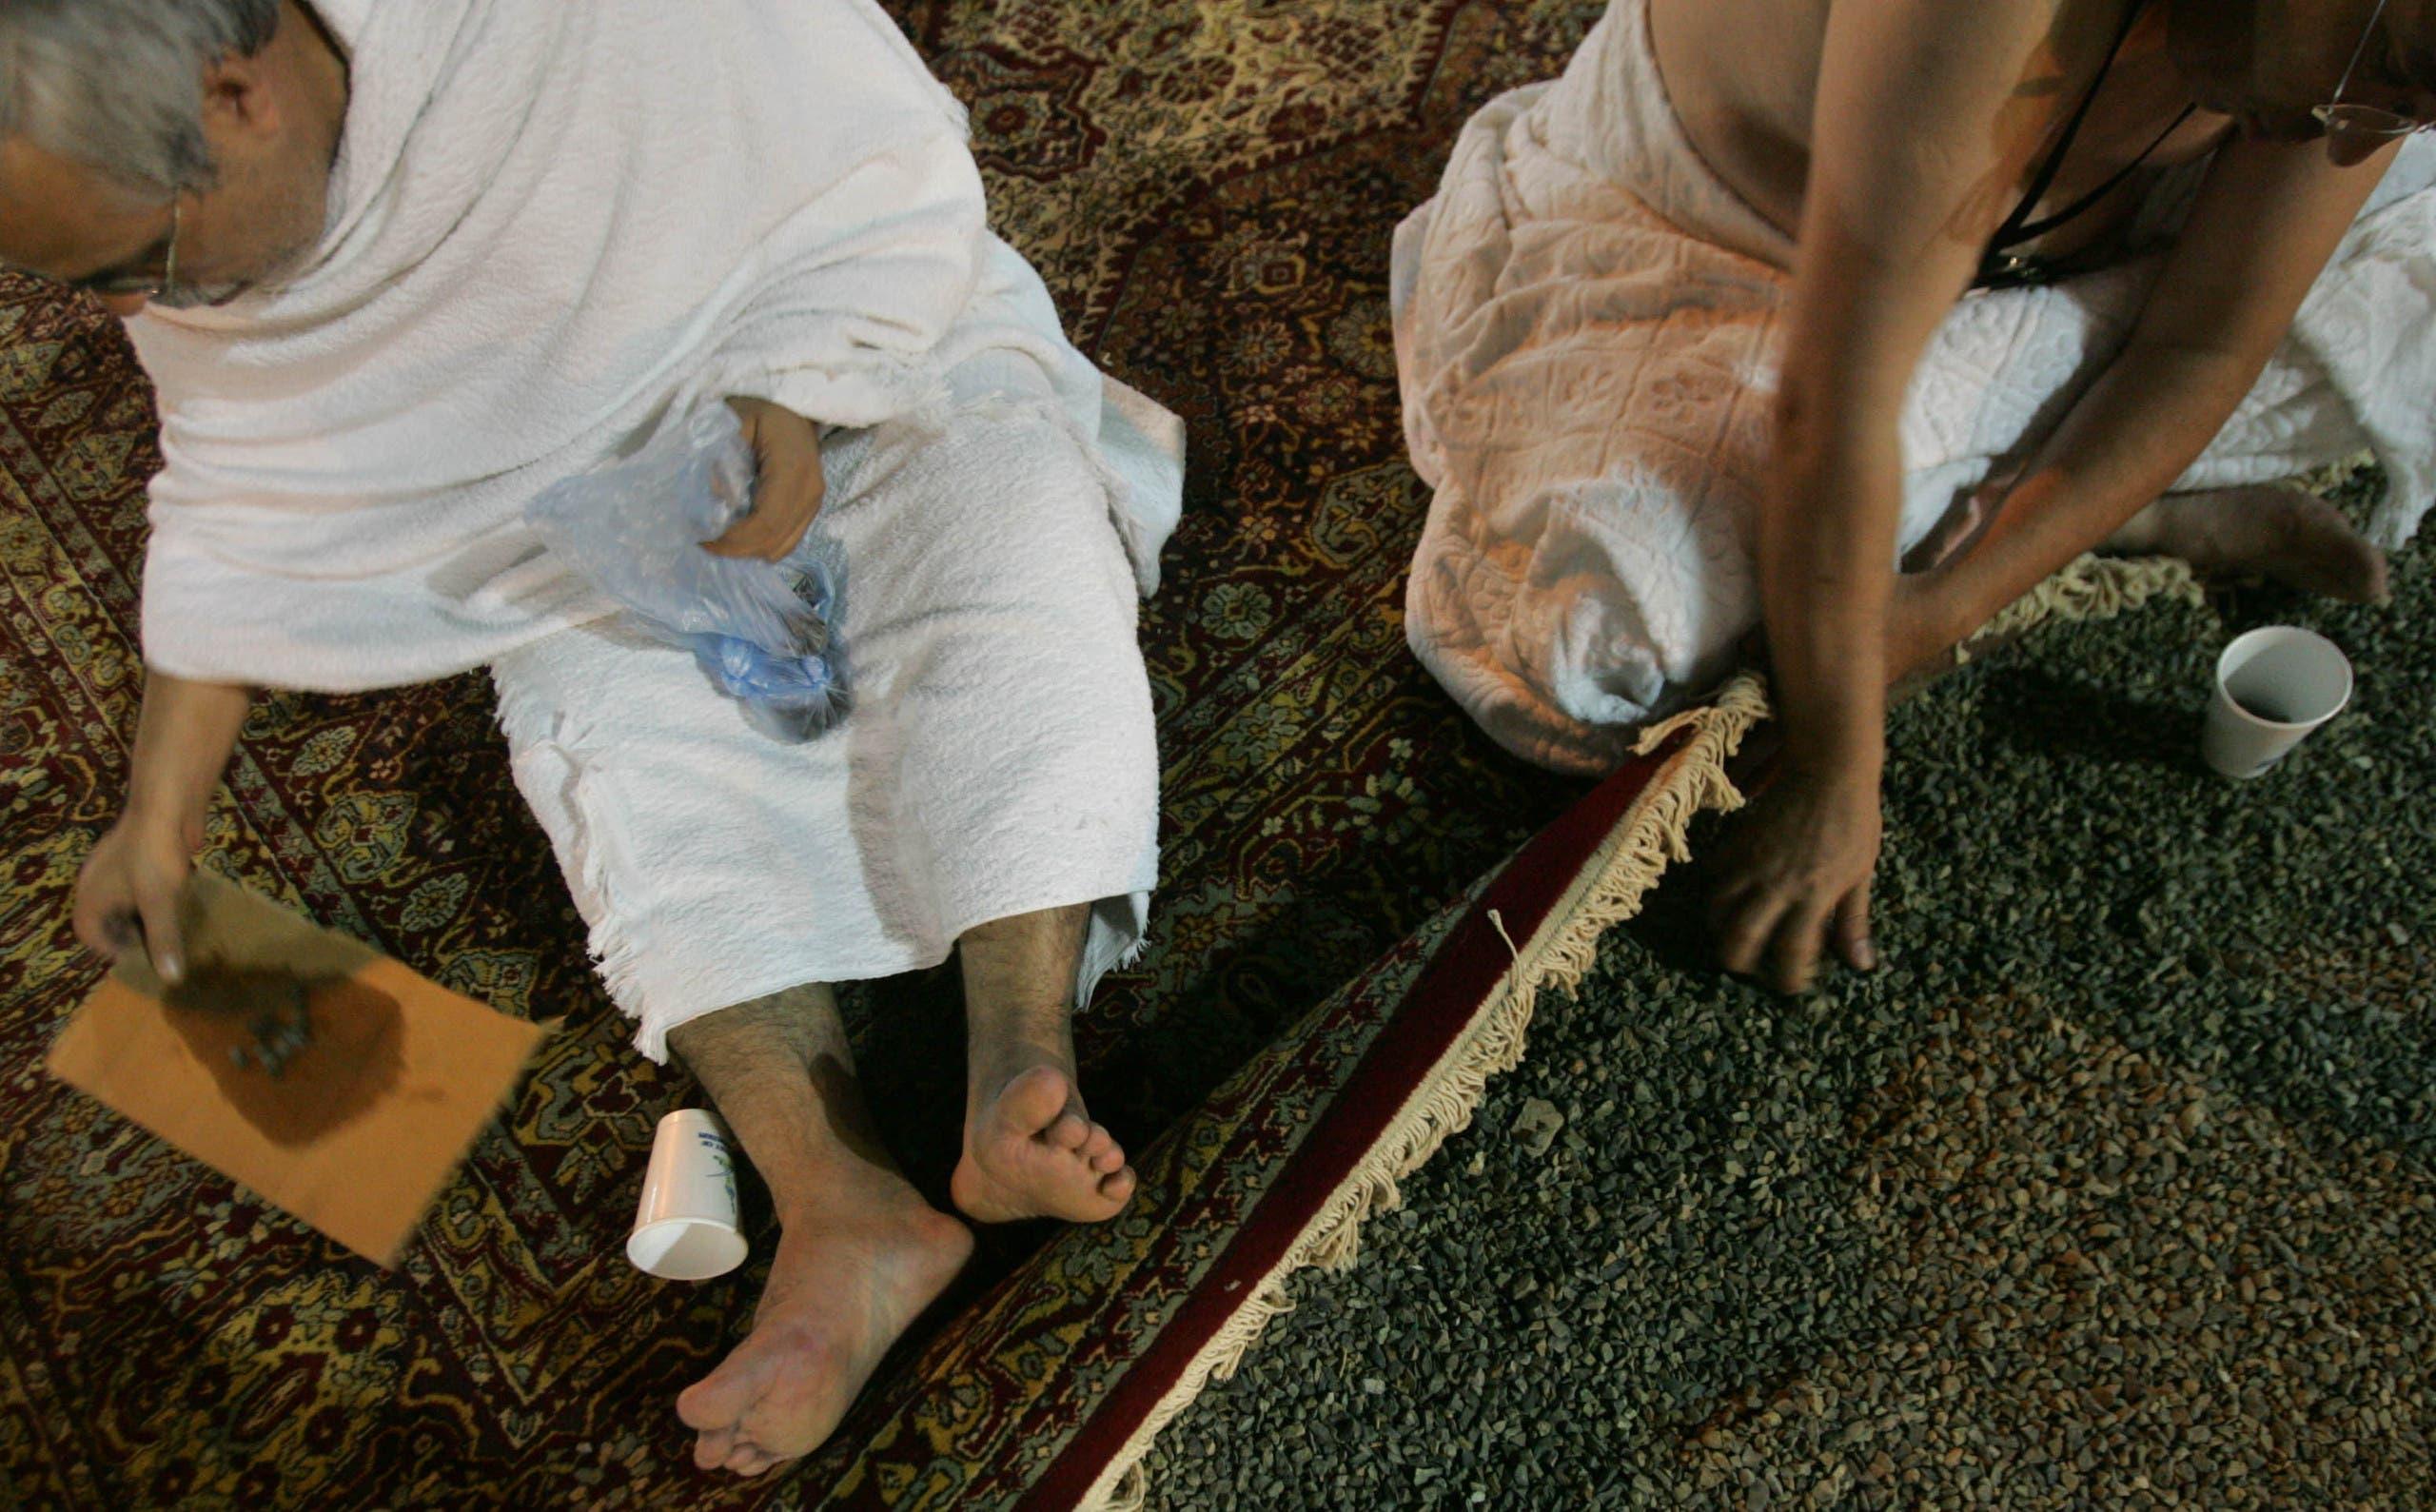 Muslim pilgrims collect stones to be thrown at a pillar representing the devil in Muzdalifah. (AP)